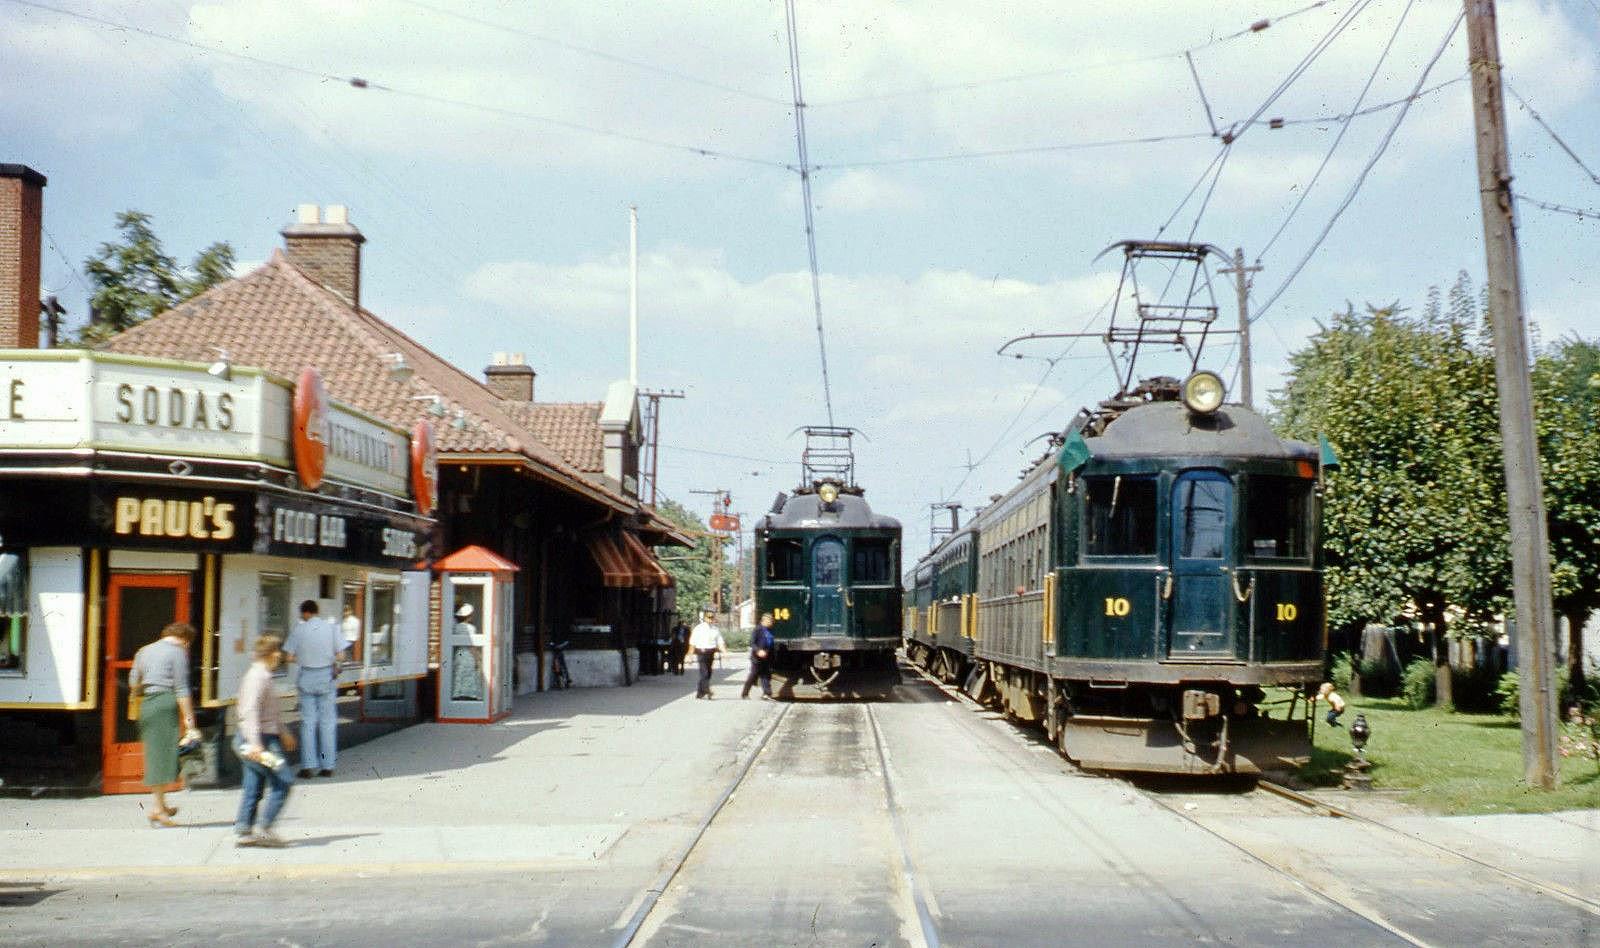 Used Cars London Ontario >> transpress nz: London and Port Stanley Railway interurban cars, Ontario, Canada